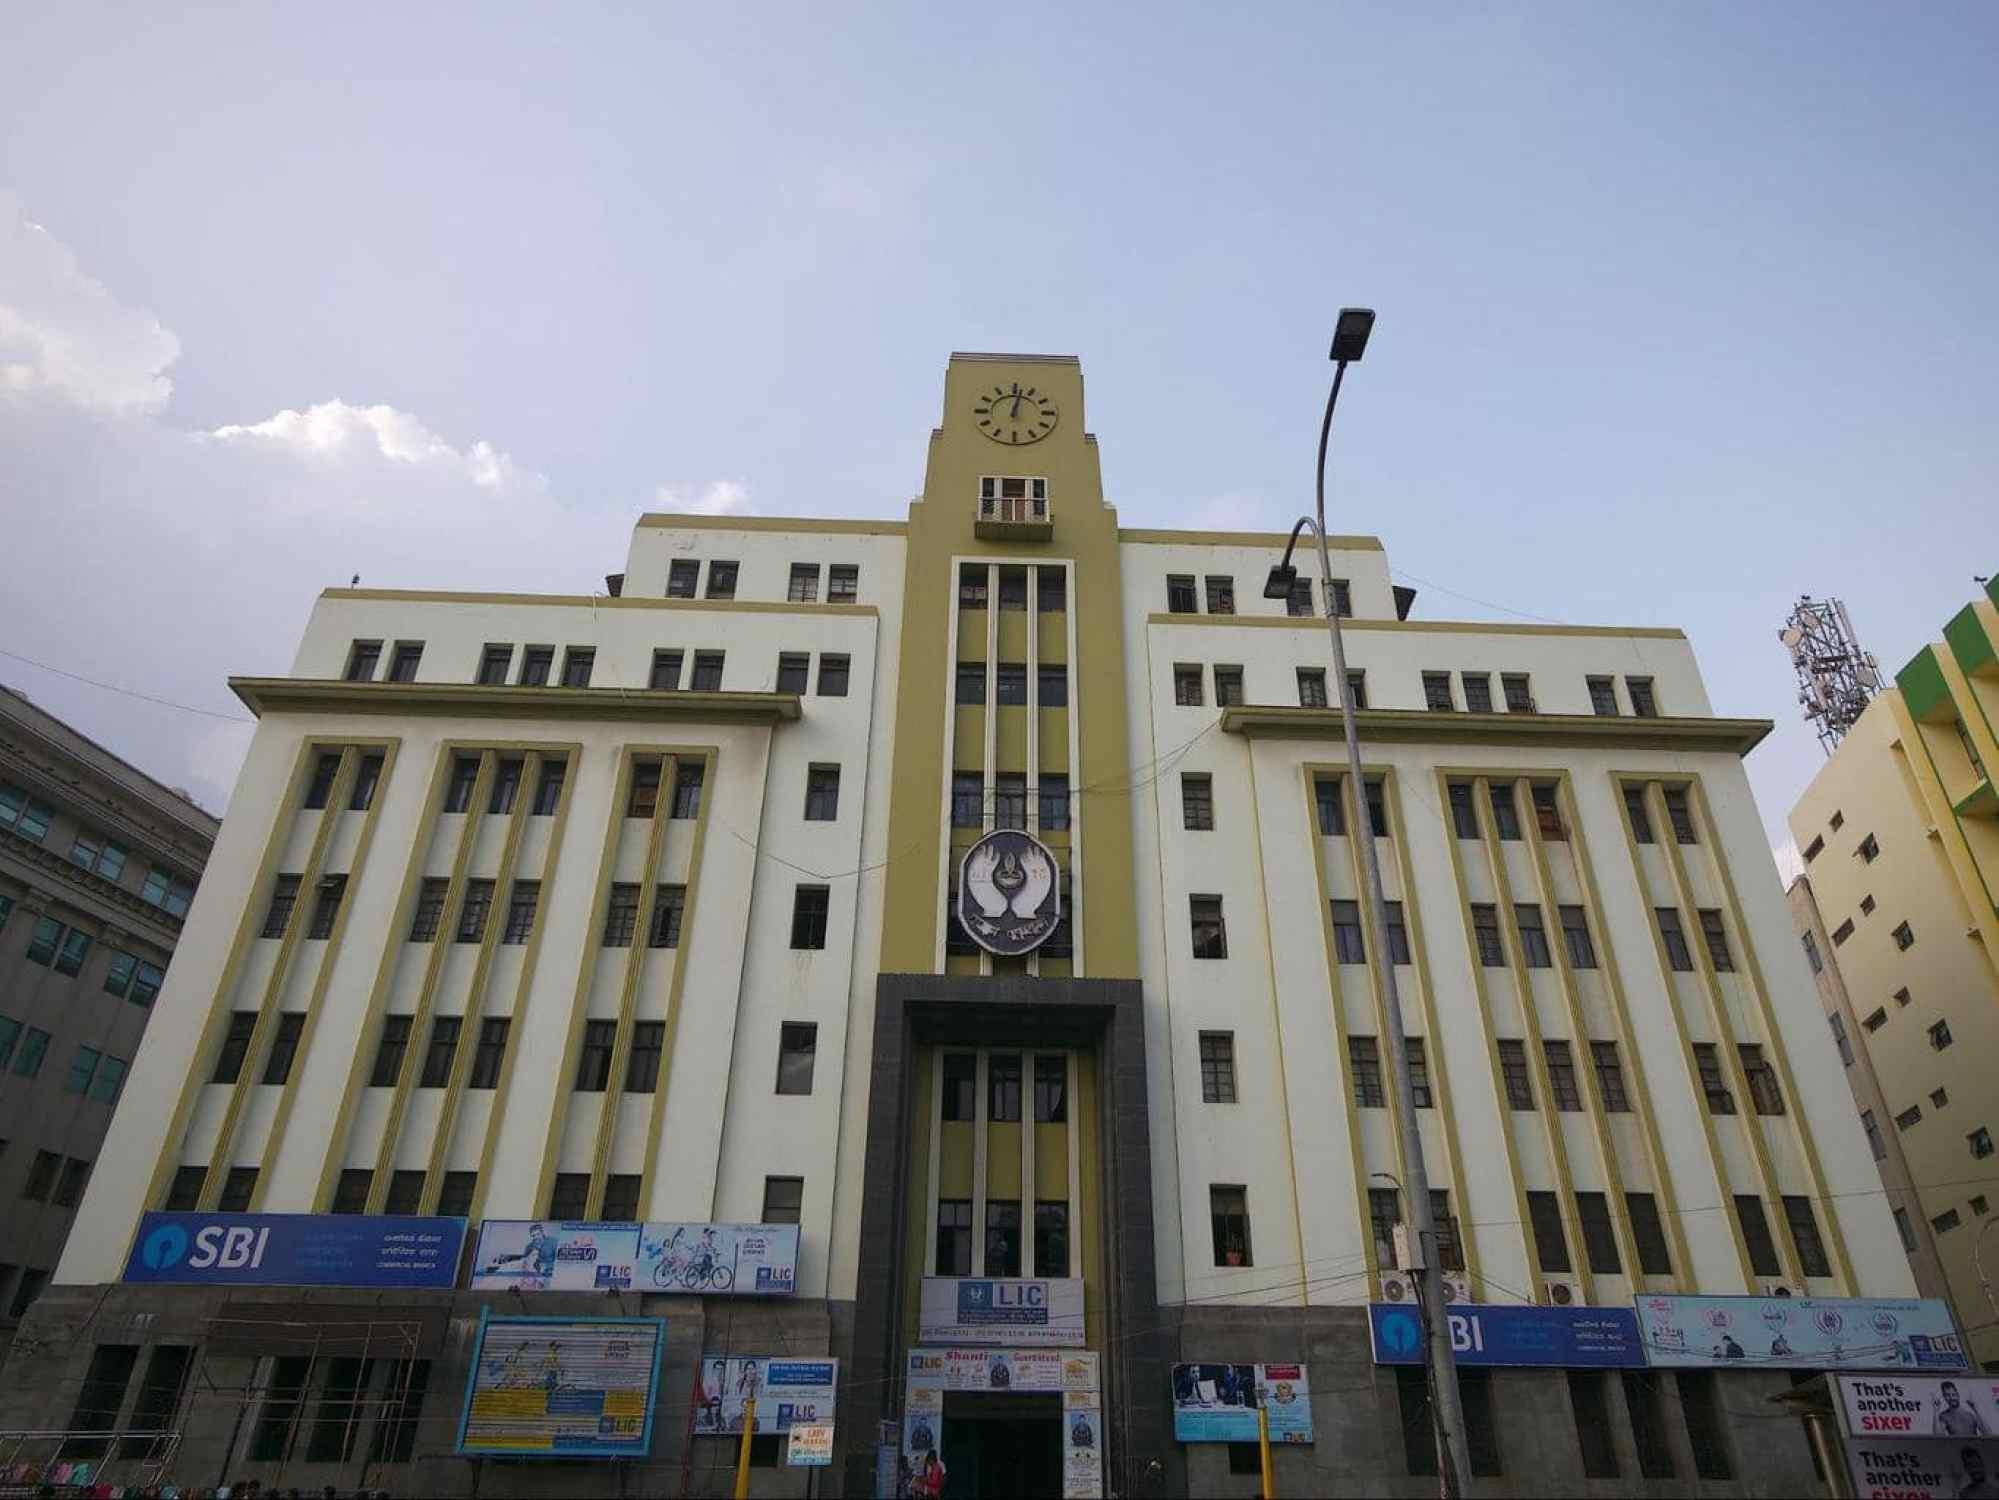 Bombay Mutual Building